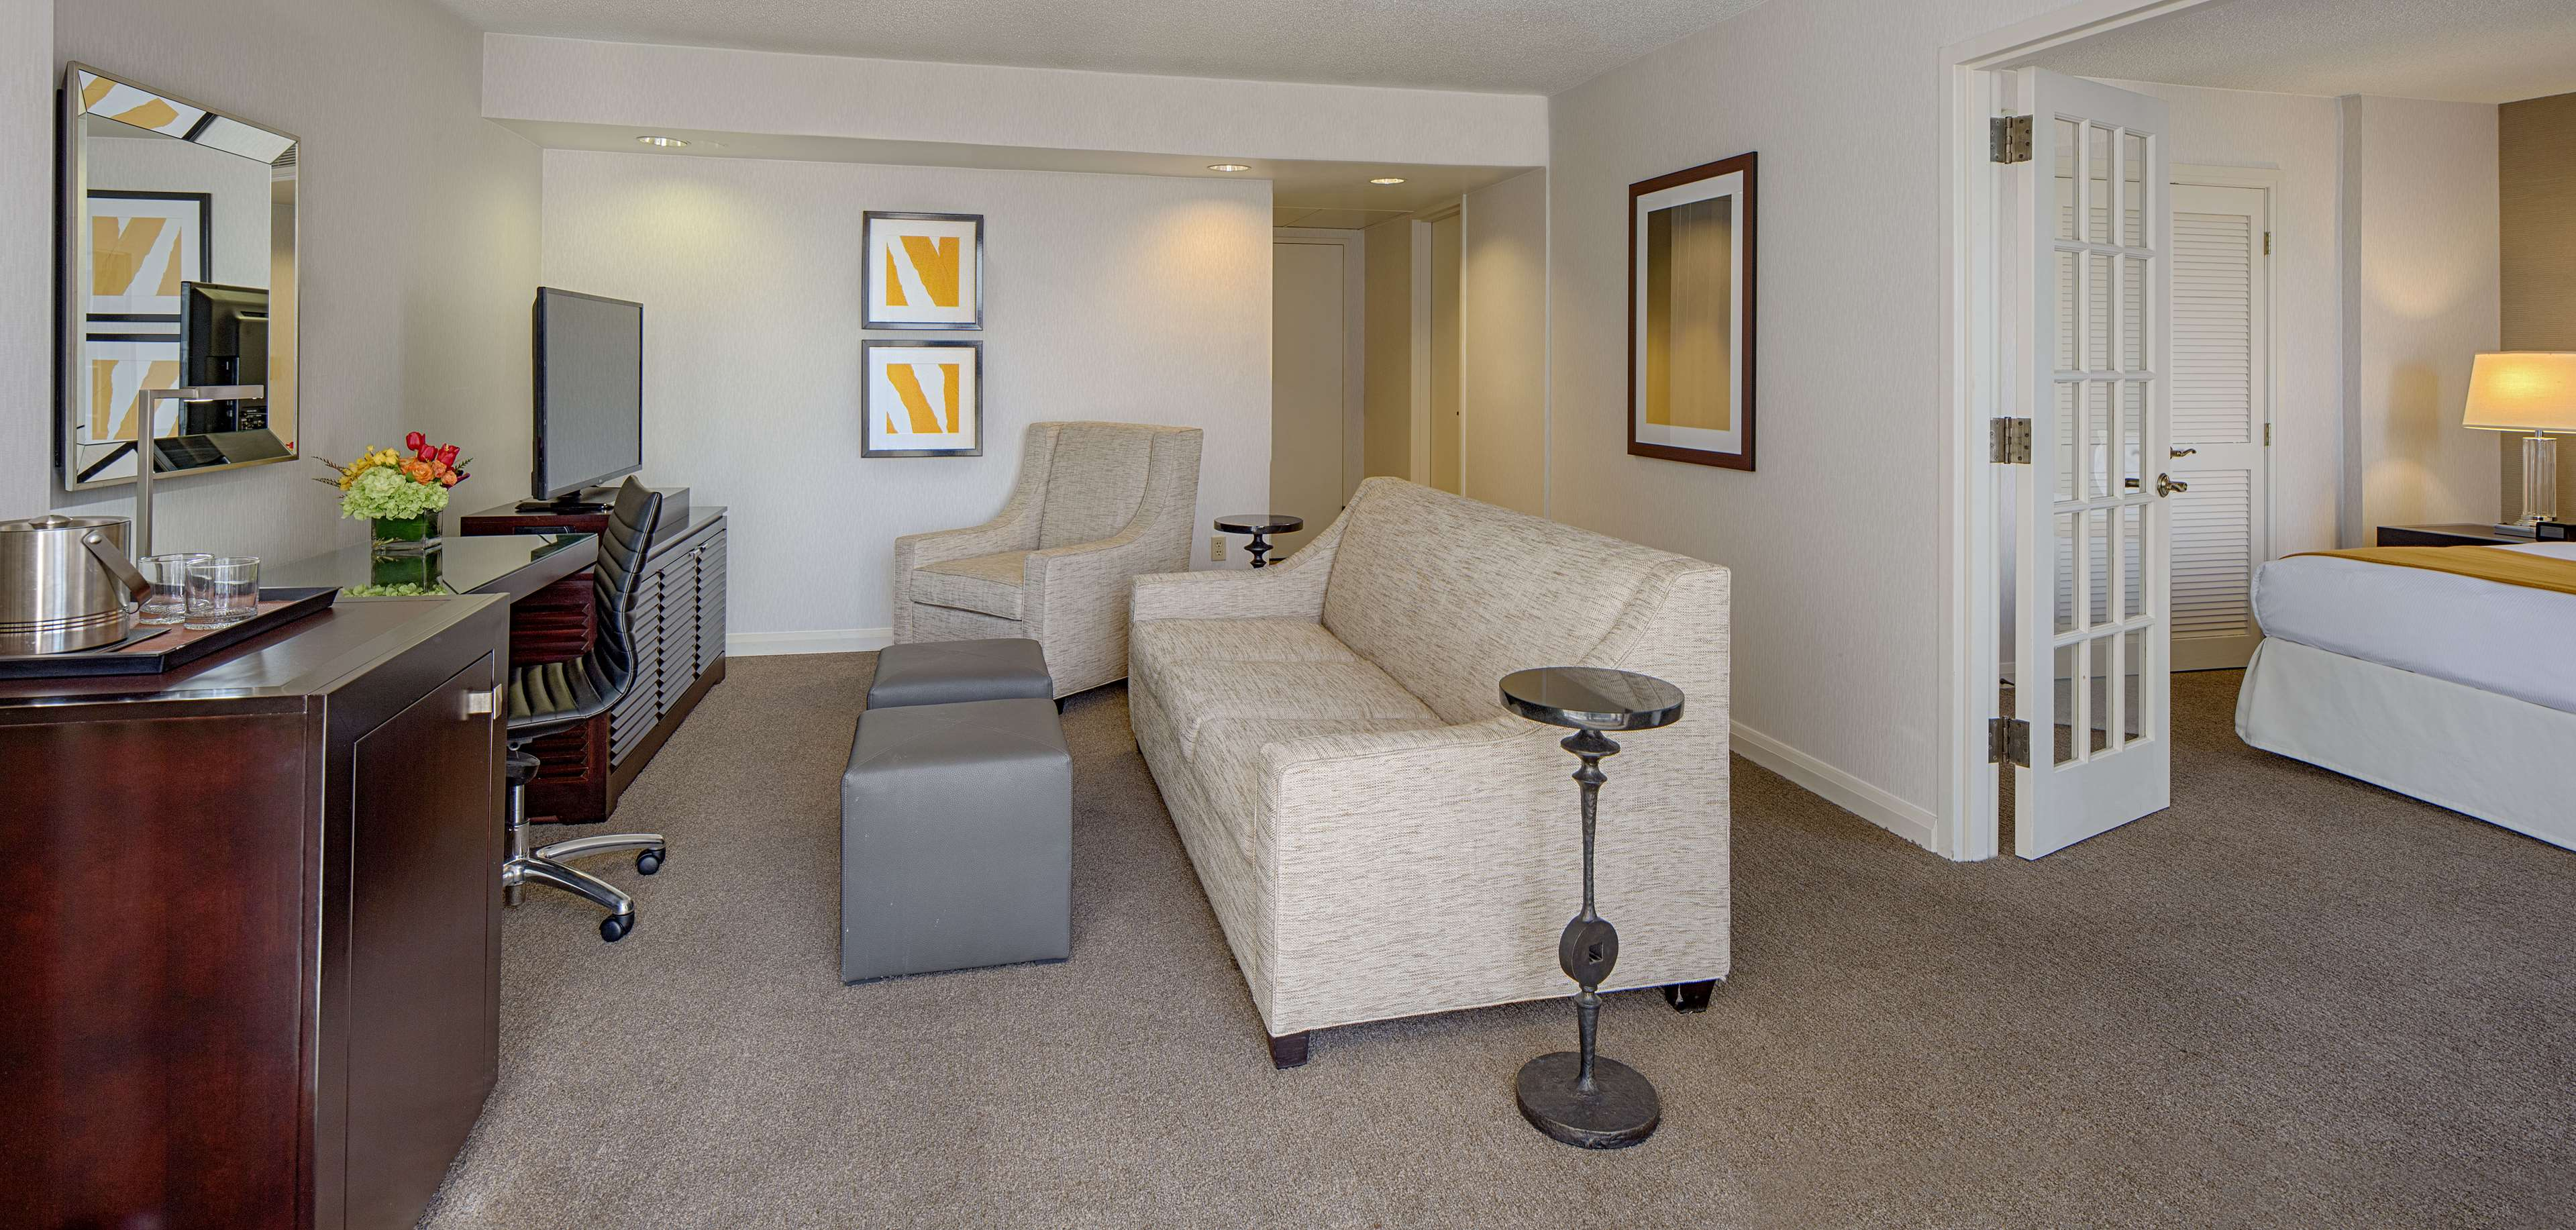 DoubleTree by Hilton Hotel Houston - Greenway Plaza image 30